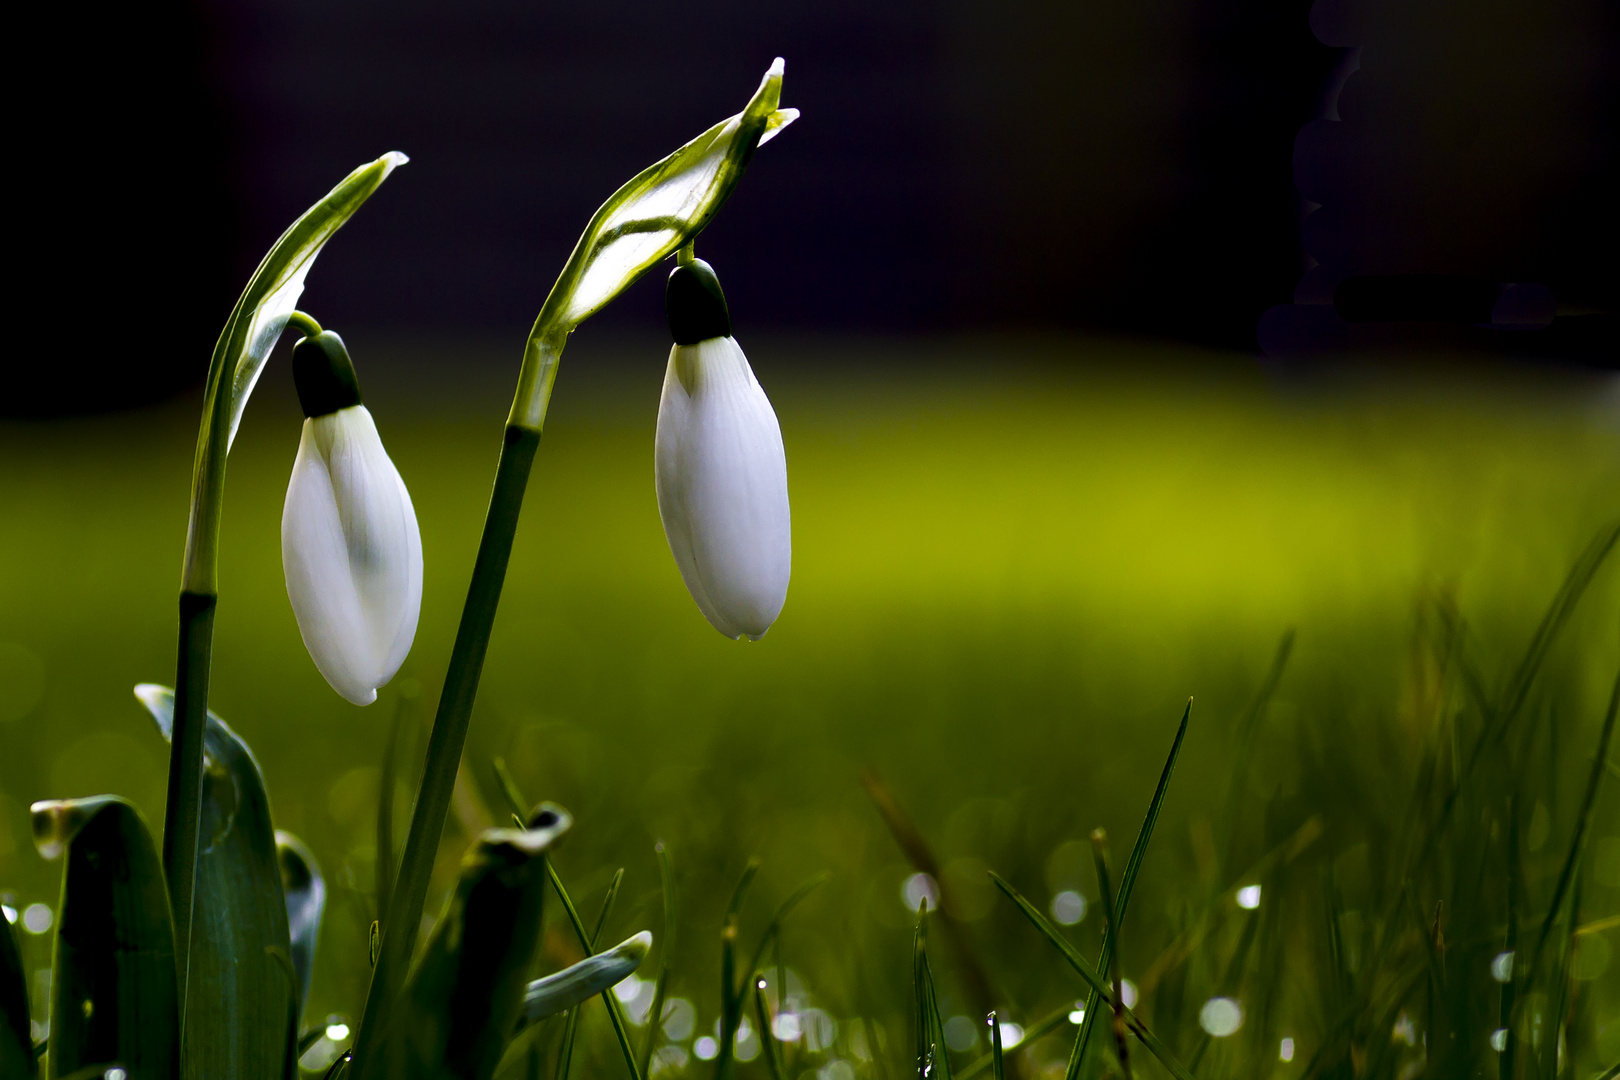 schneegl ckchen im februar foto bild pflanzen pilze flechten pflanzen im winter natur. Black Bedroom Furniture Sets. Home Design Ideas